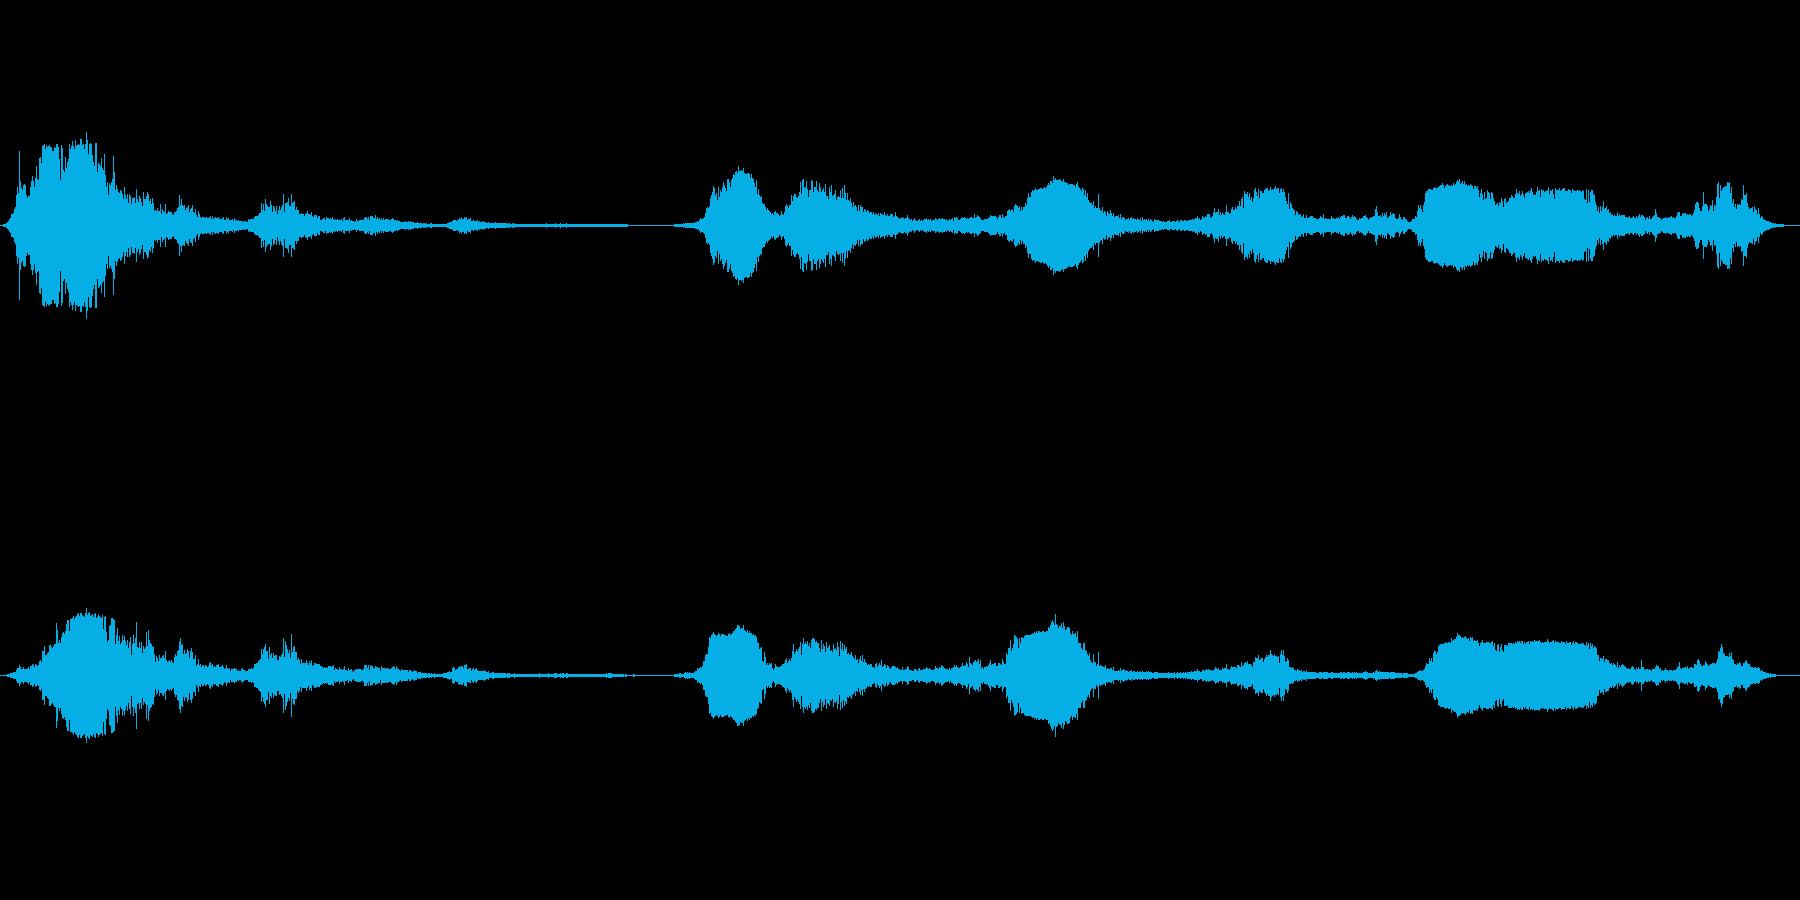 F-16:パス、数回の戦闘機と爆撃機の再生済みの波形